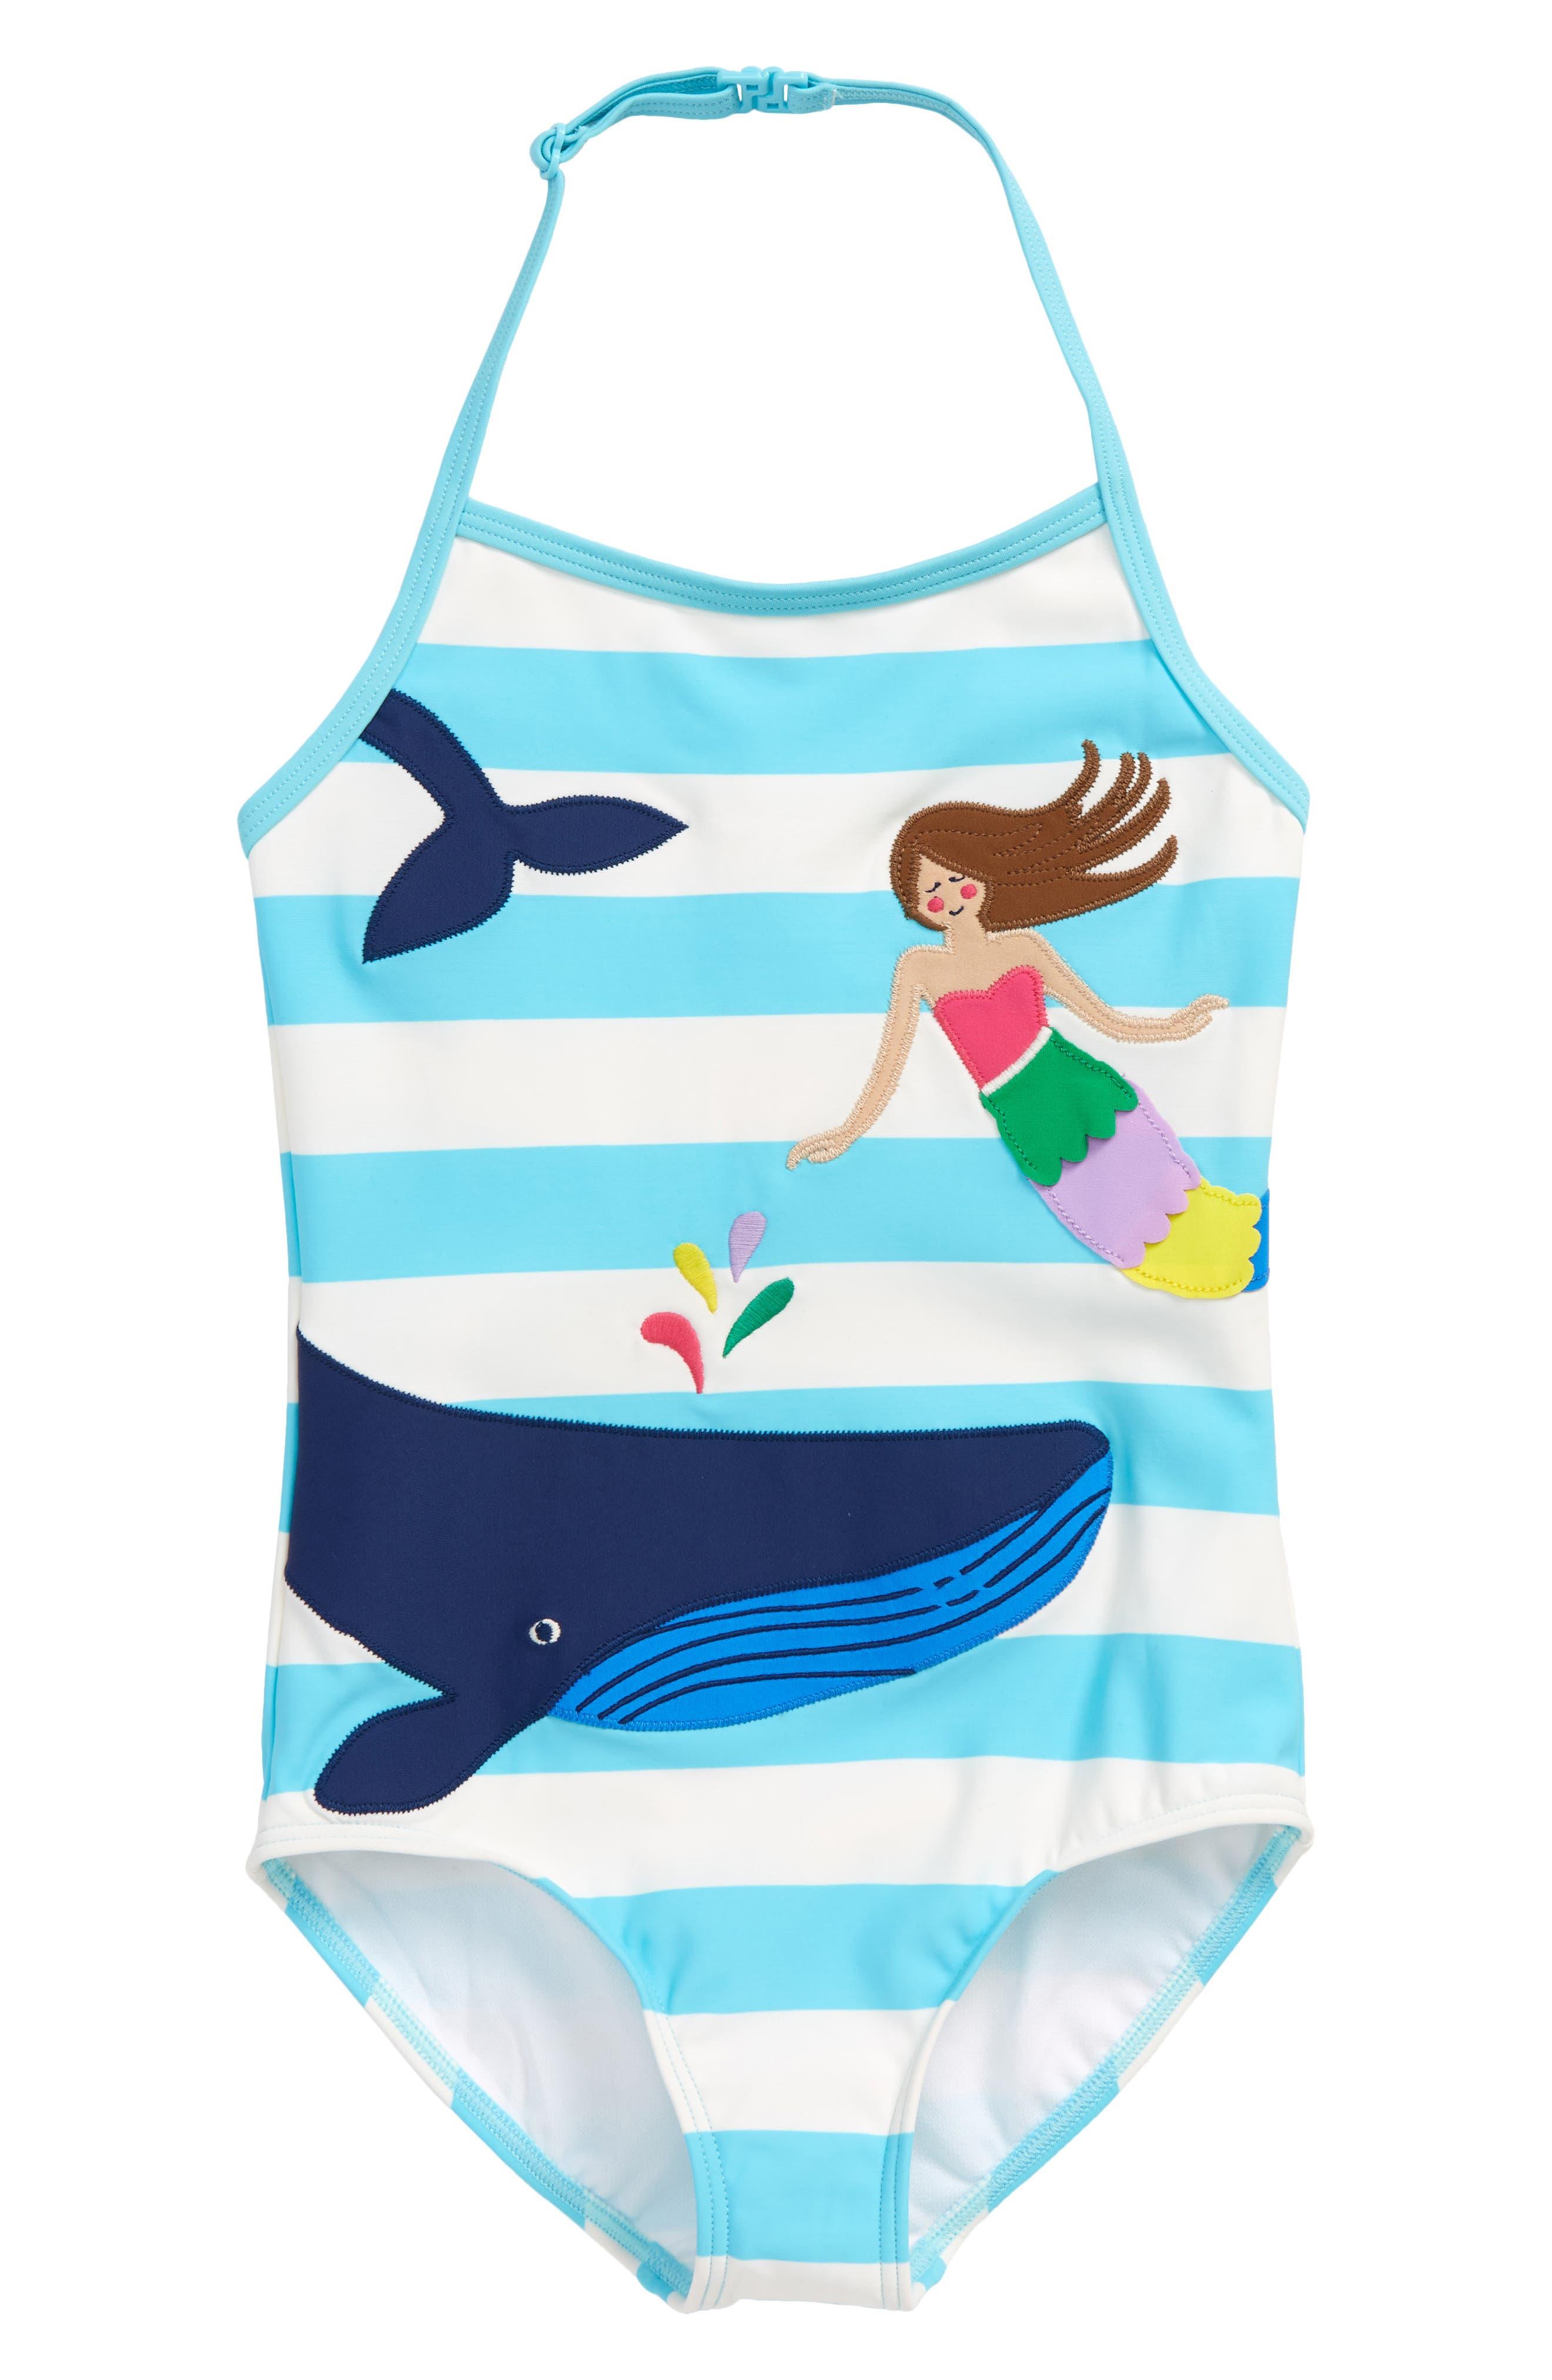 Custom Kids Swimsuit Toddler Swimwear Personalized Kids Swimsuit Custom Kids Dog Swimsuit Custom Kids Bathing Suit Custom Girl Swimsuit